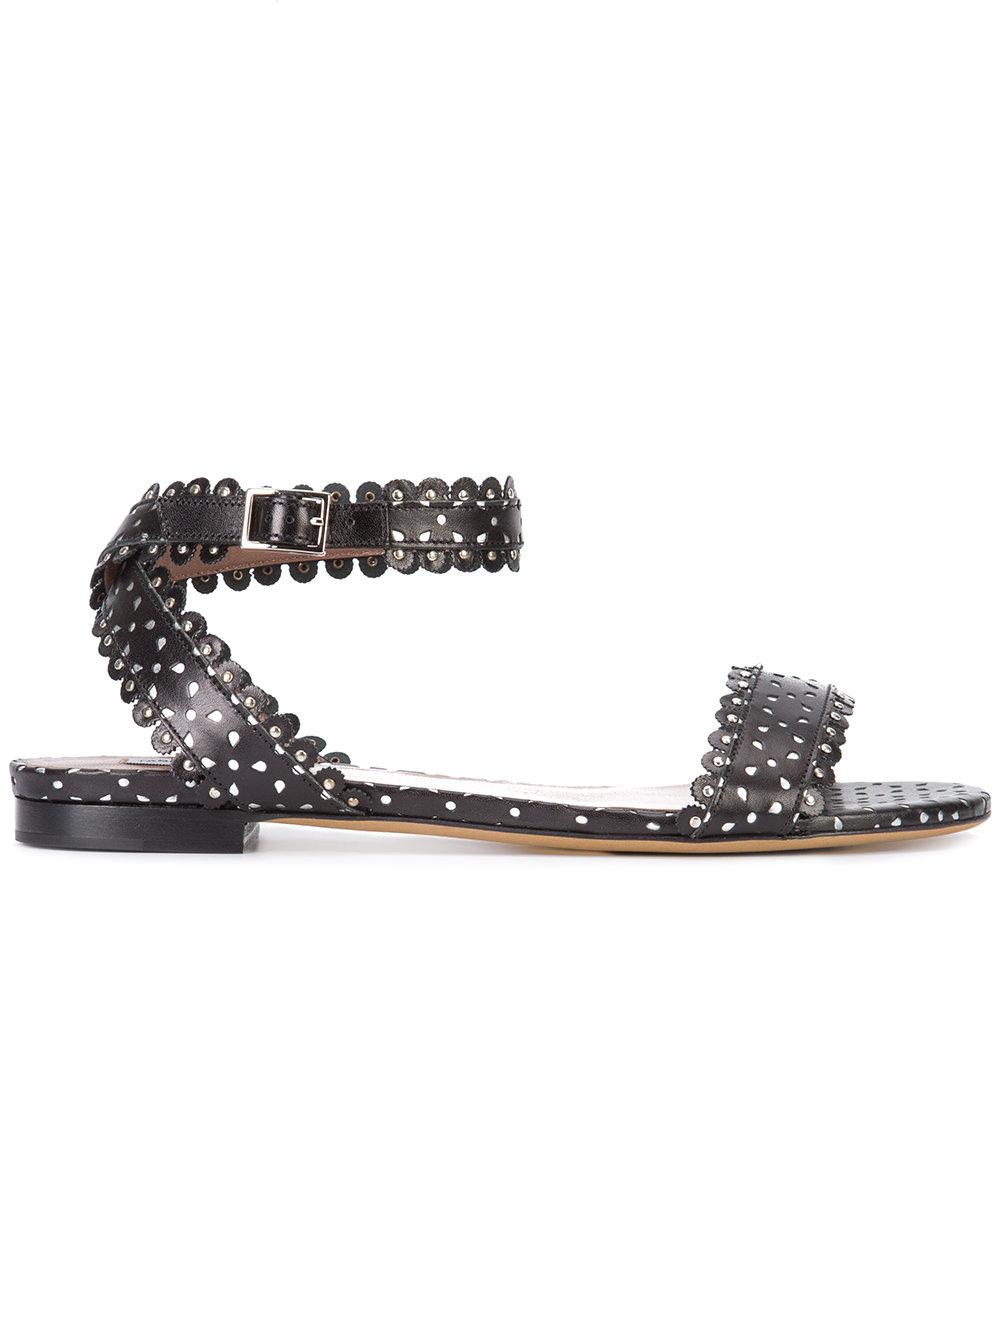 Pretty Tabitha Simmons Hermione   Comfy Tabitha Simmons Shoes